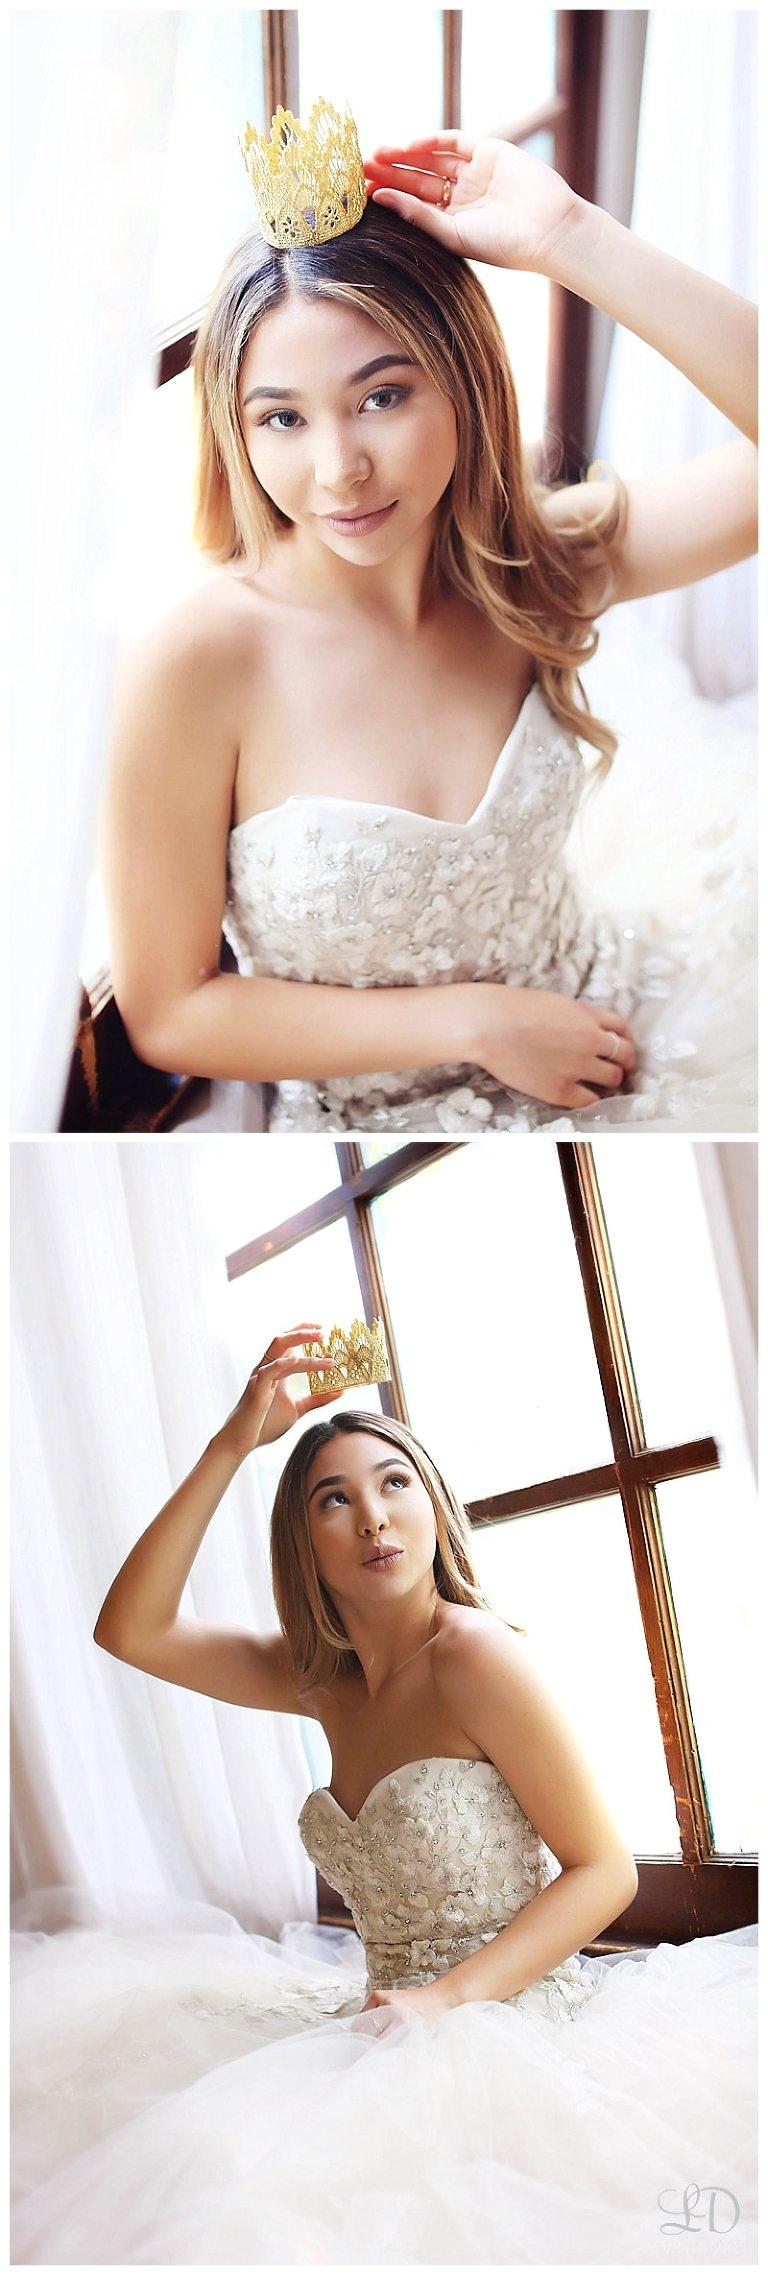 sweet sixteen photoshoot-lori dorman photography-beauty shoot_1622.jpg